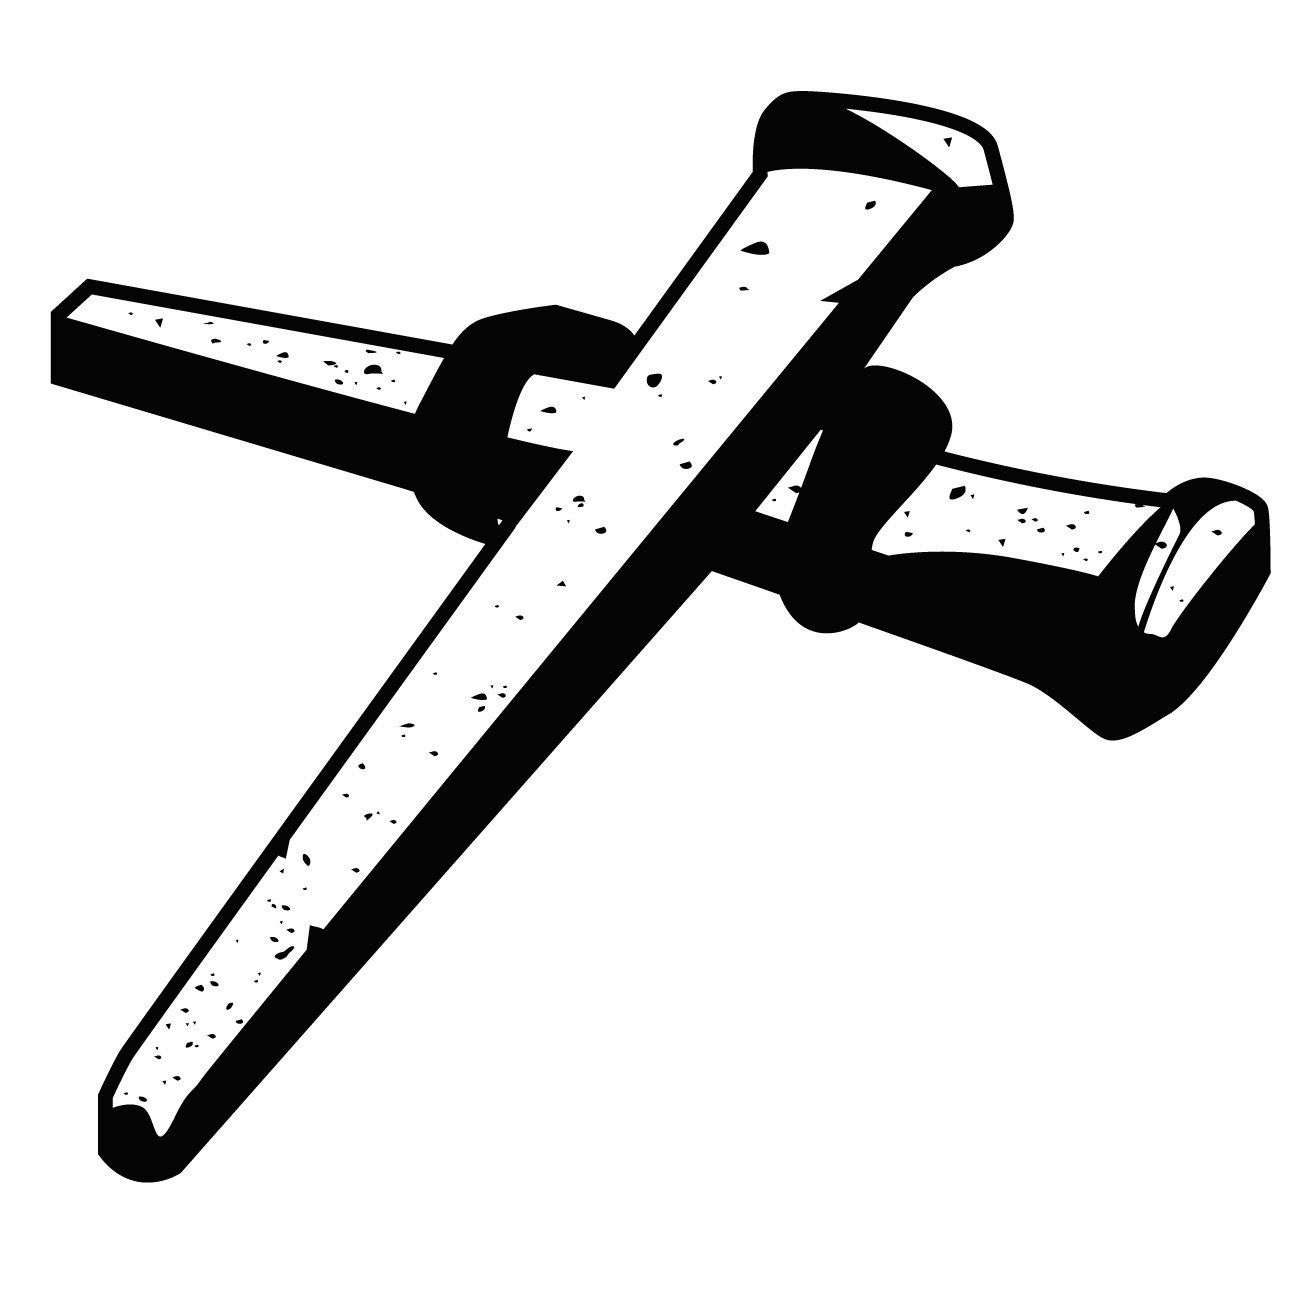 Nail cross clipart 4 » Clipart Portal.